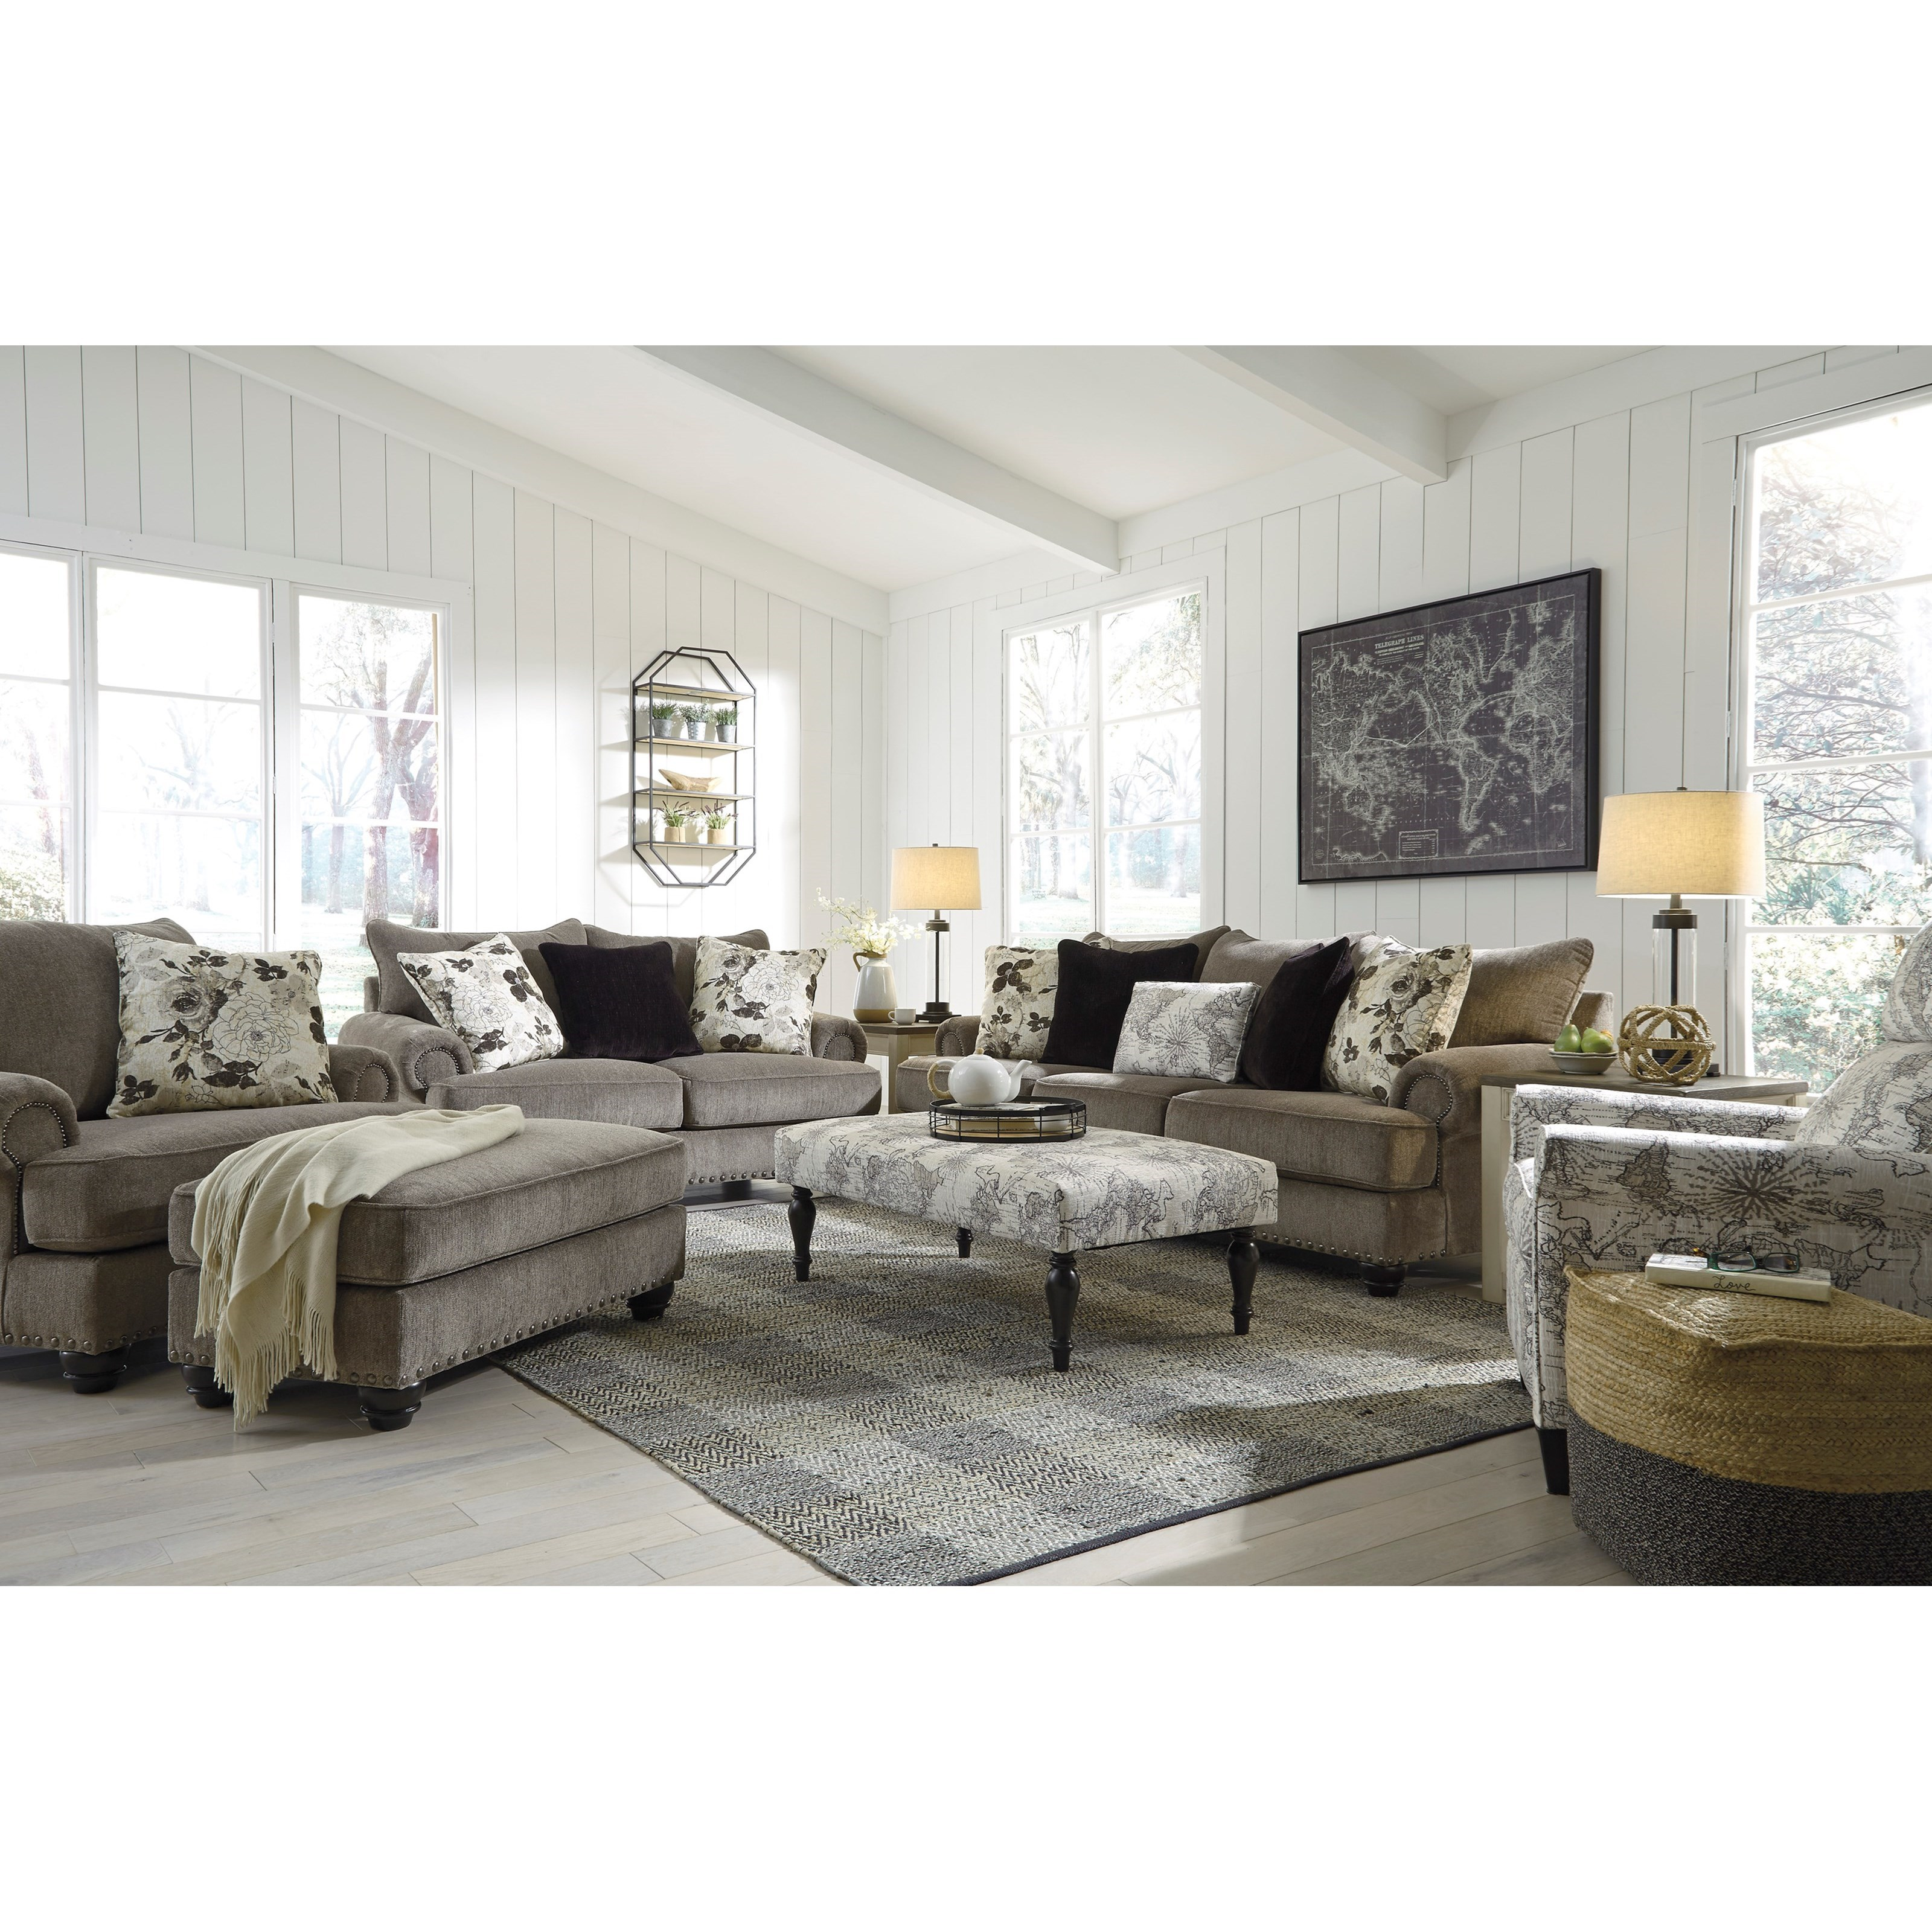 Sembler Living Room Group by Benchcraft at Walker's Furniture